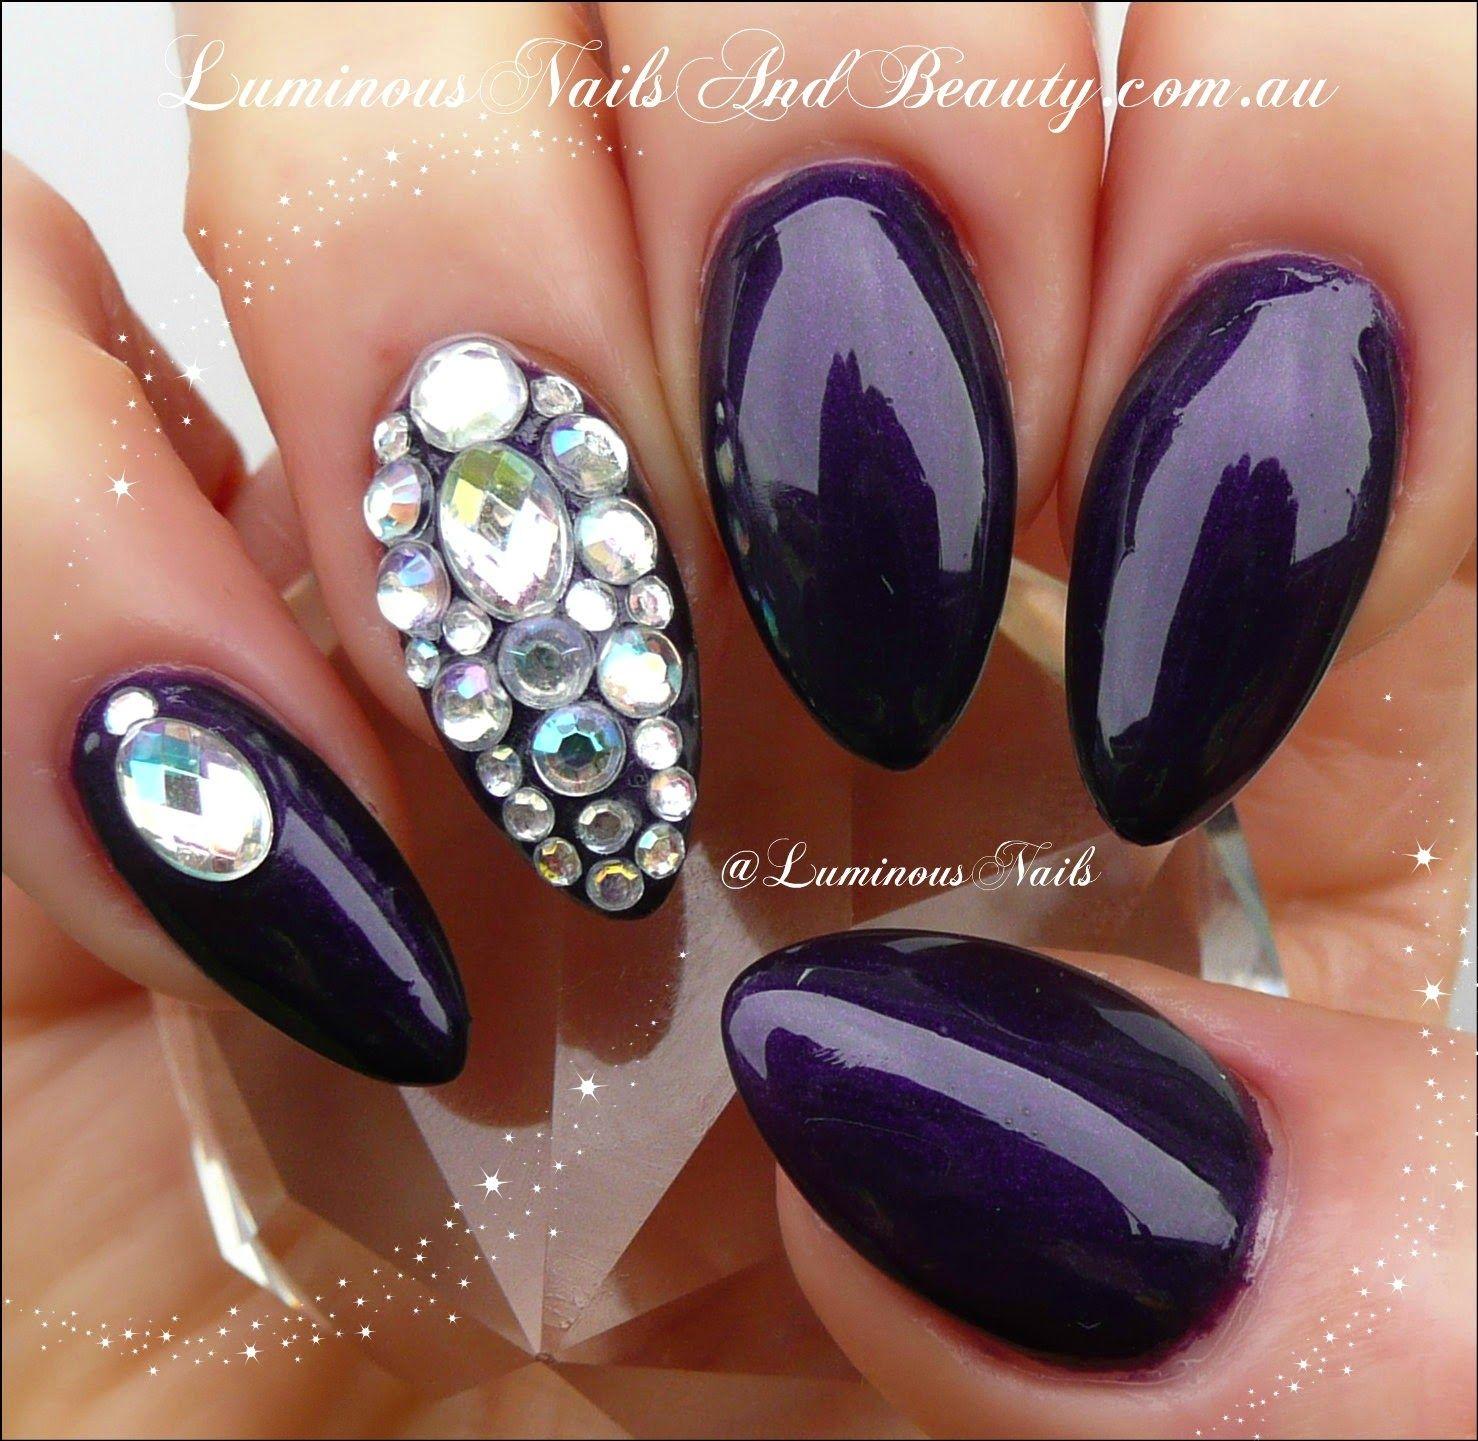 Luminous Nails: Deep Purple Nails with Bling...   Nails   Pinterest ...